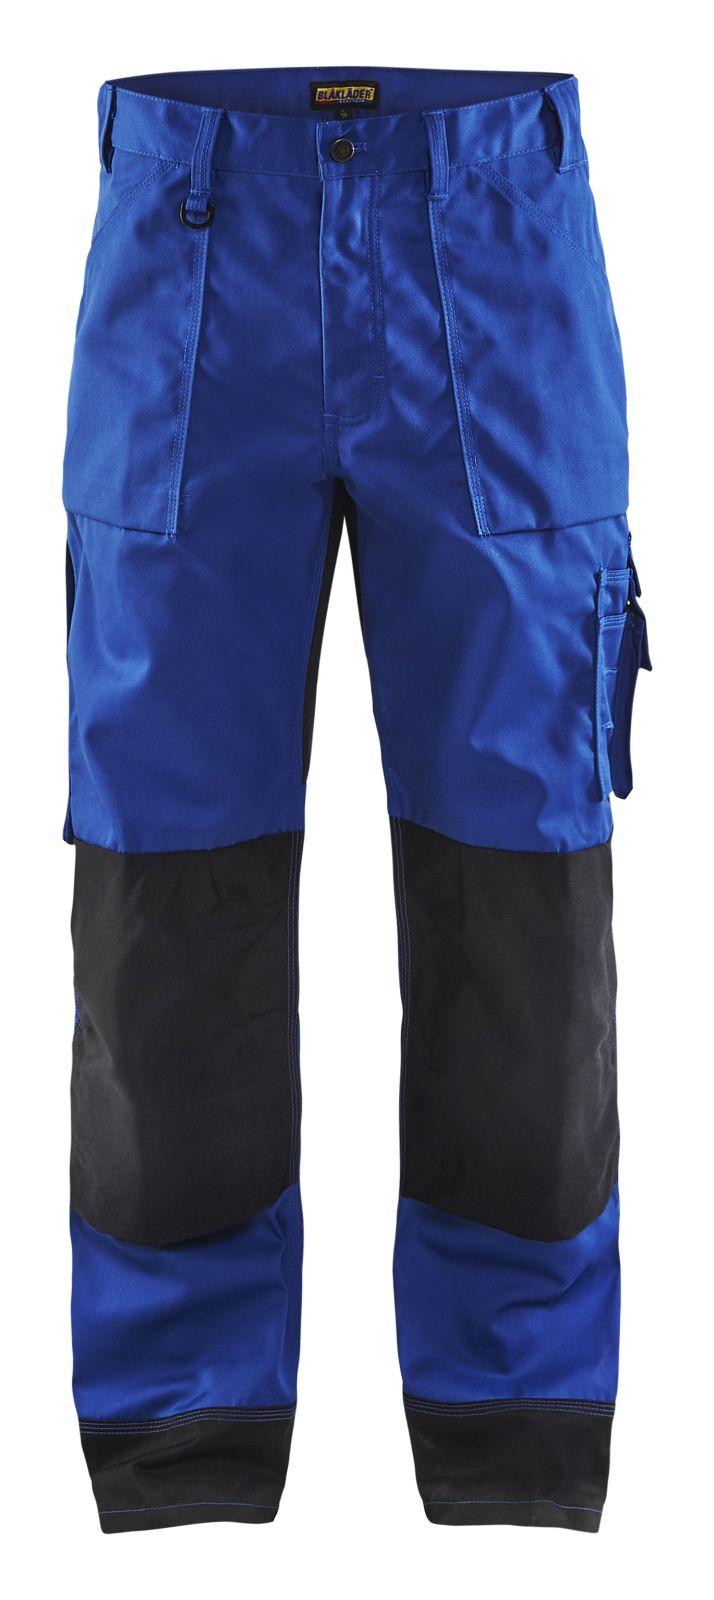 Blaklader Werkbroeken 15231860 korenblauw-zwart(8599)